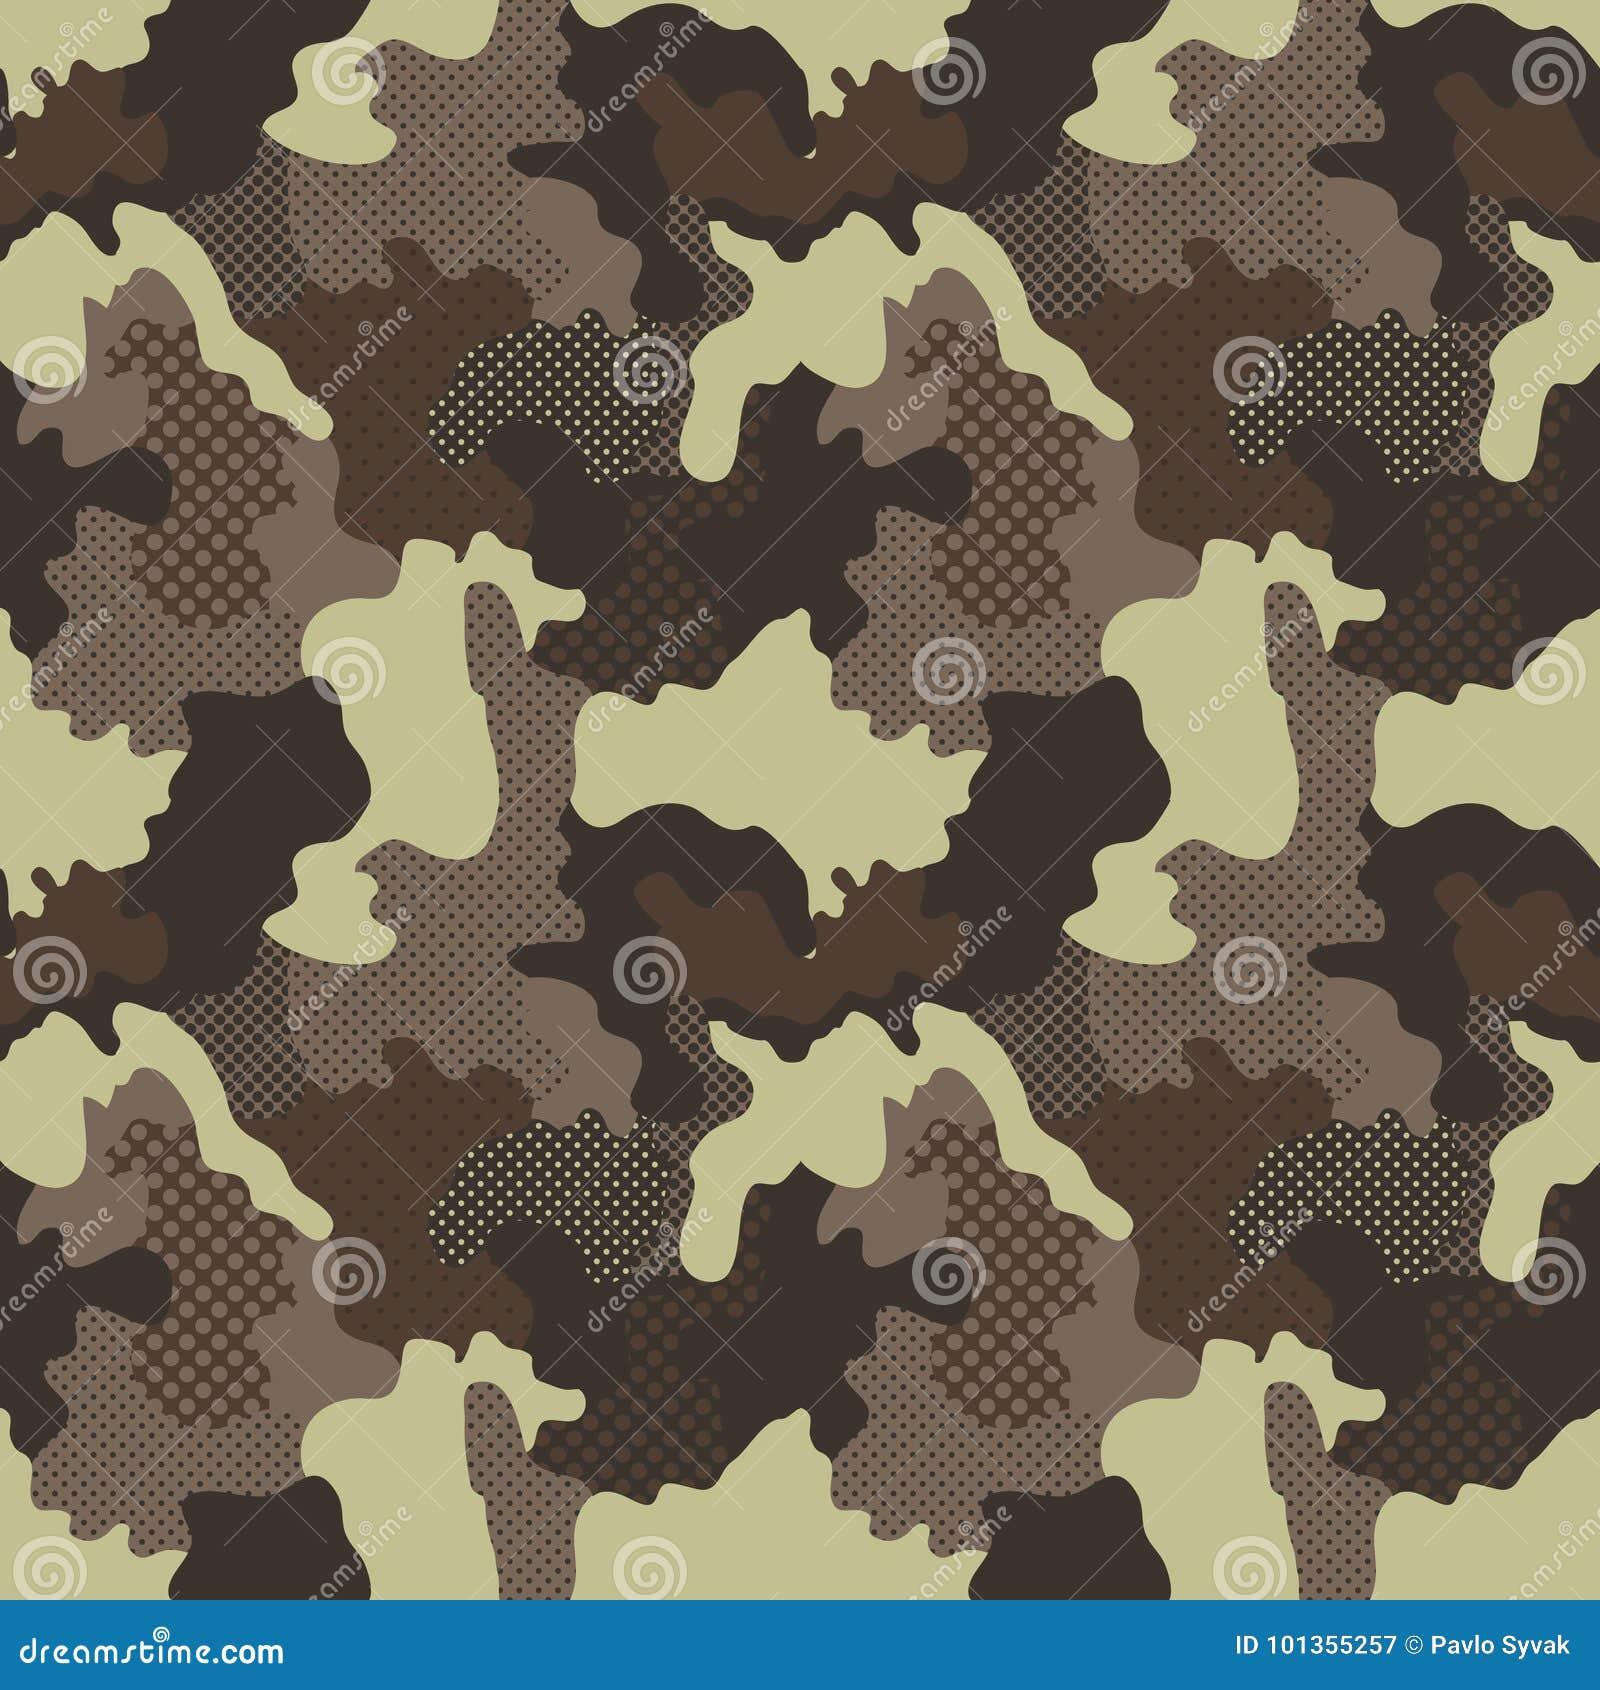 Modelo Inconsútil Militar Fondo Del Camuflaje Textura De La Moda ...